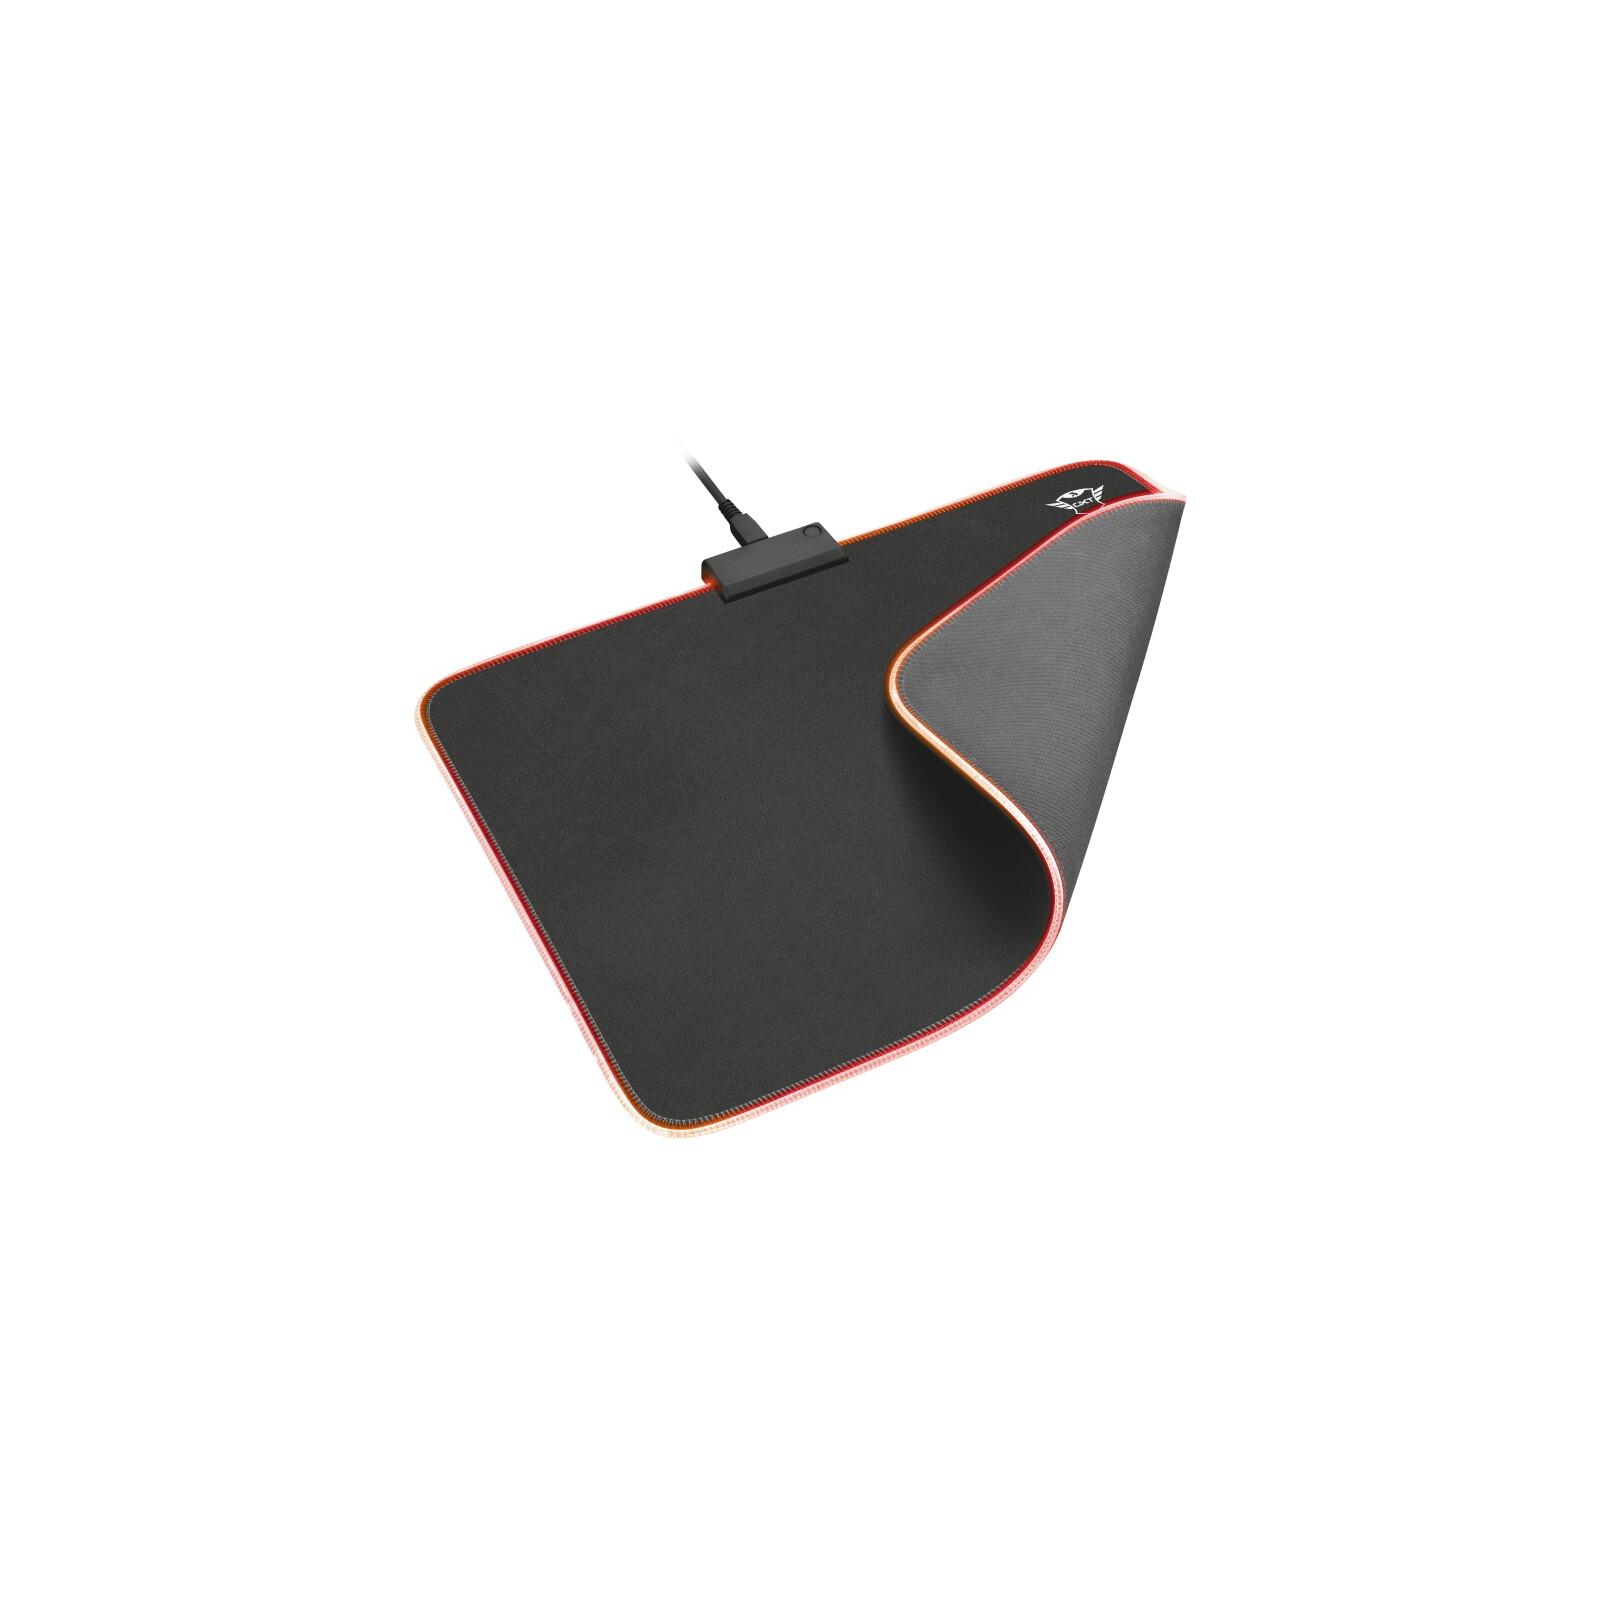 Trust GXT 762 Glide-Flex Illuminated Flexible Mousepad